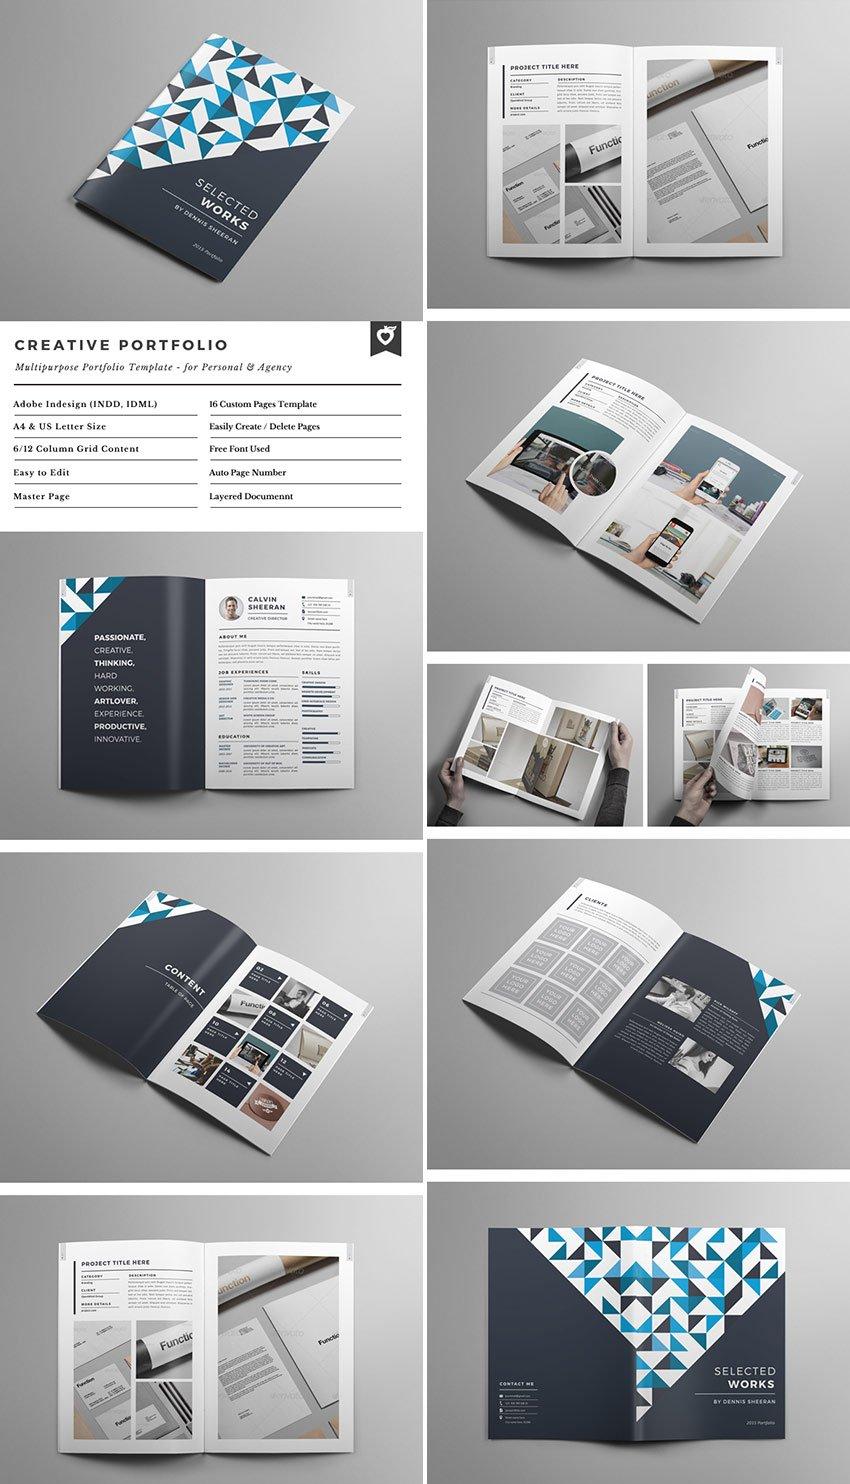 Creative Portfolio Brochure INDD